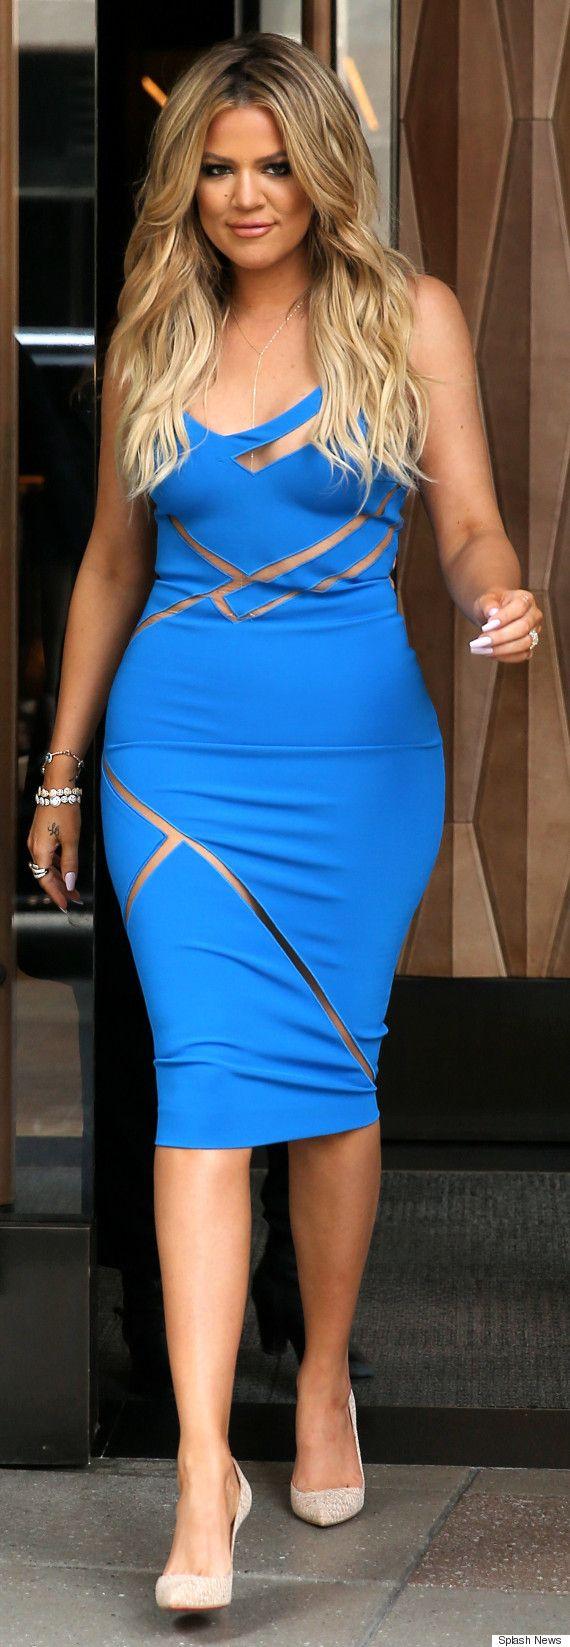 Khloe Kardashian heats up BookCon in a bright blue, figure-hugging dress